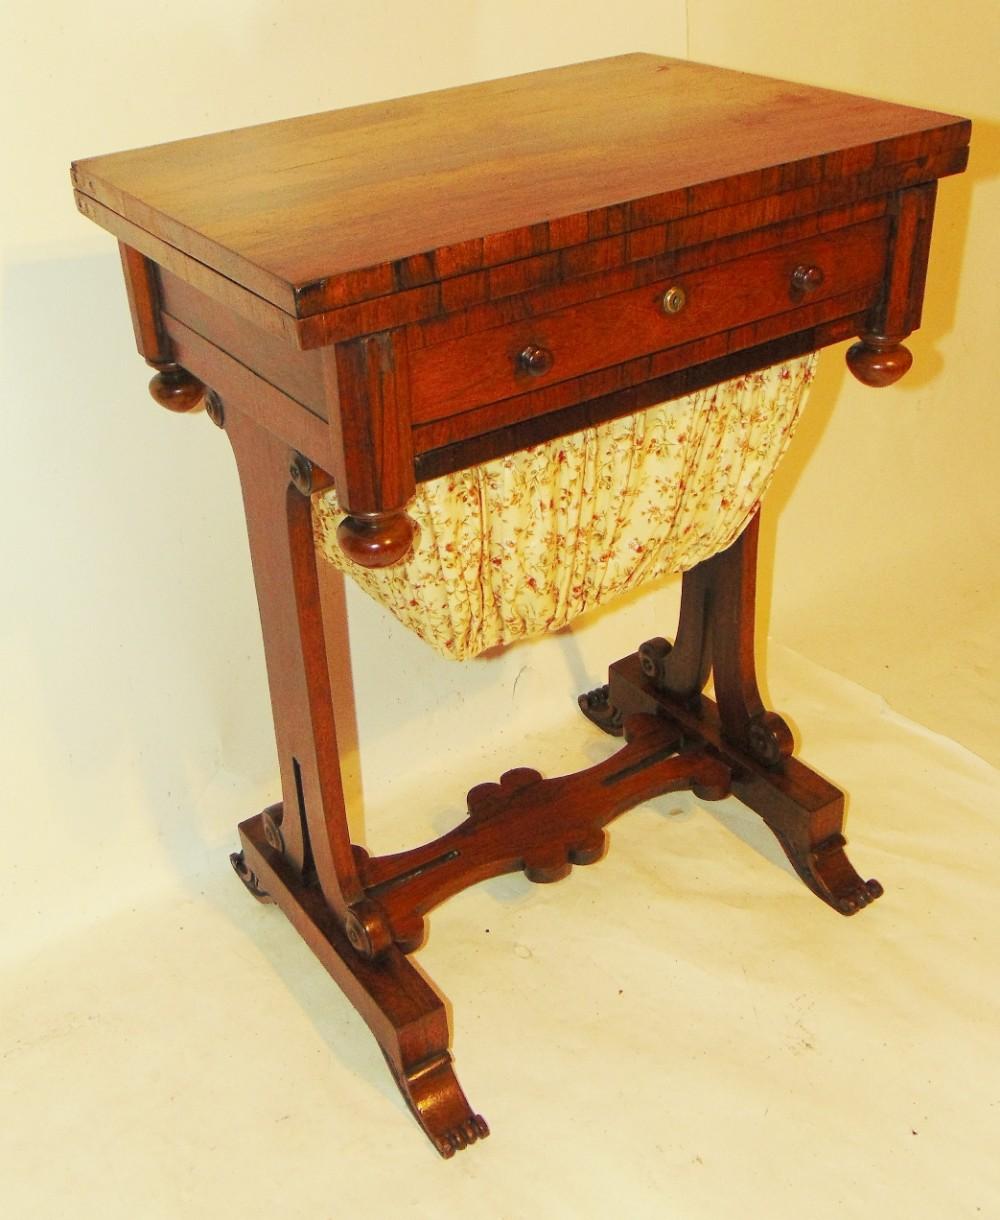 regency rosewood workgames table circa 1830